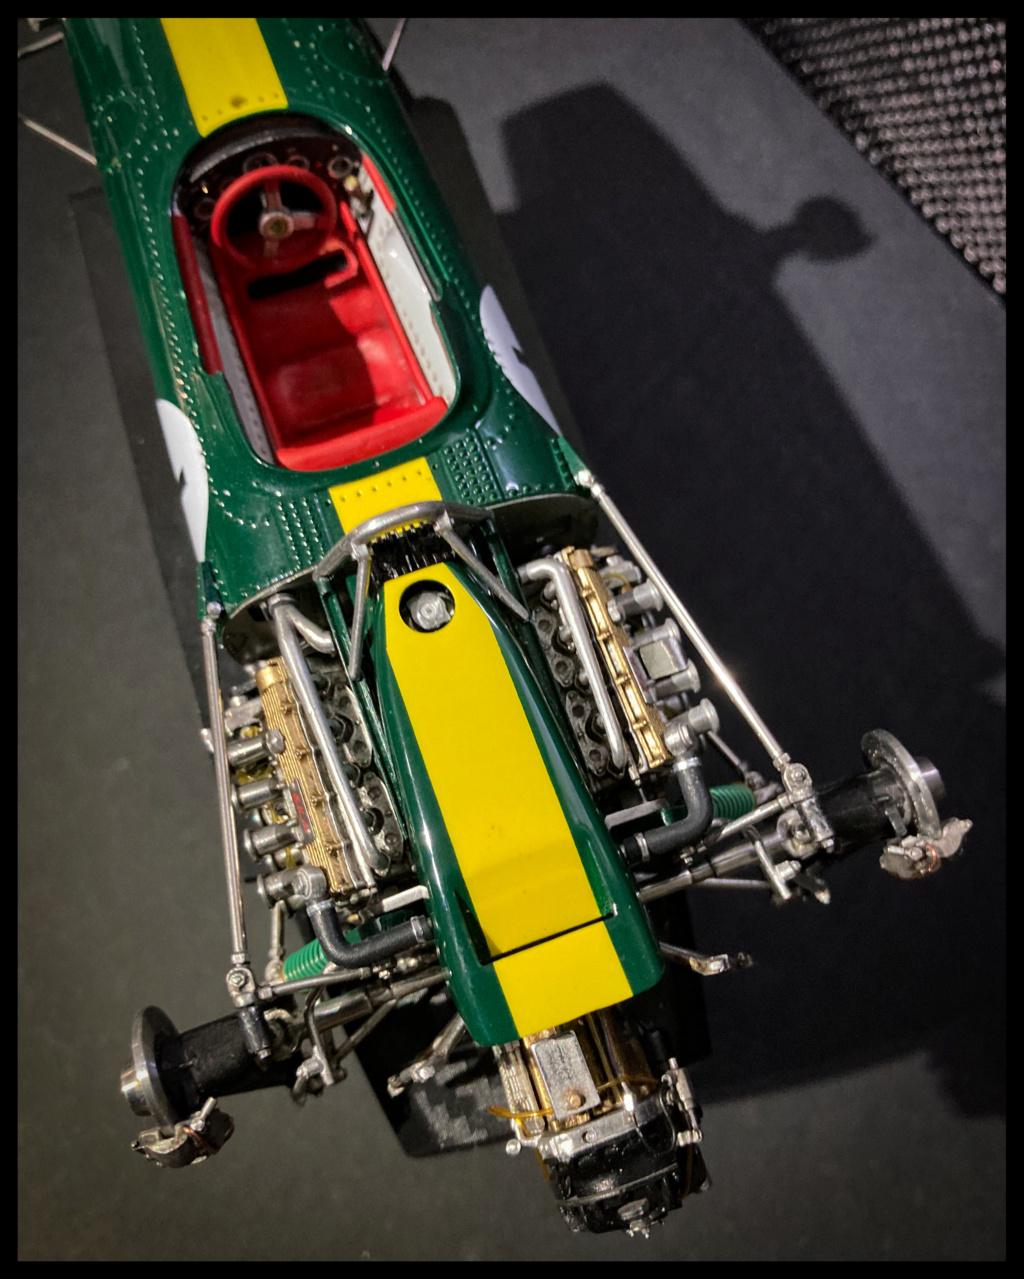 Lotus 43 BRM, Jim Clark, US GP 1966 Watkins Glen. MFH 1/20. C21c4110